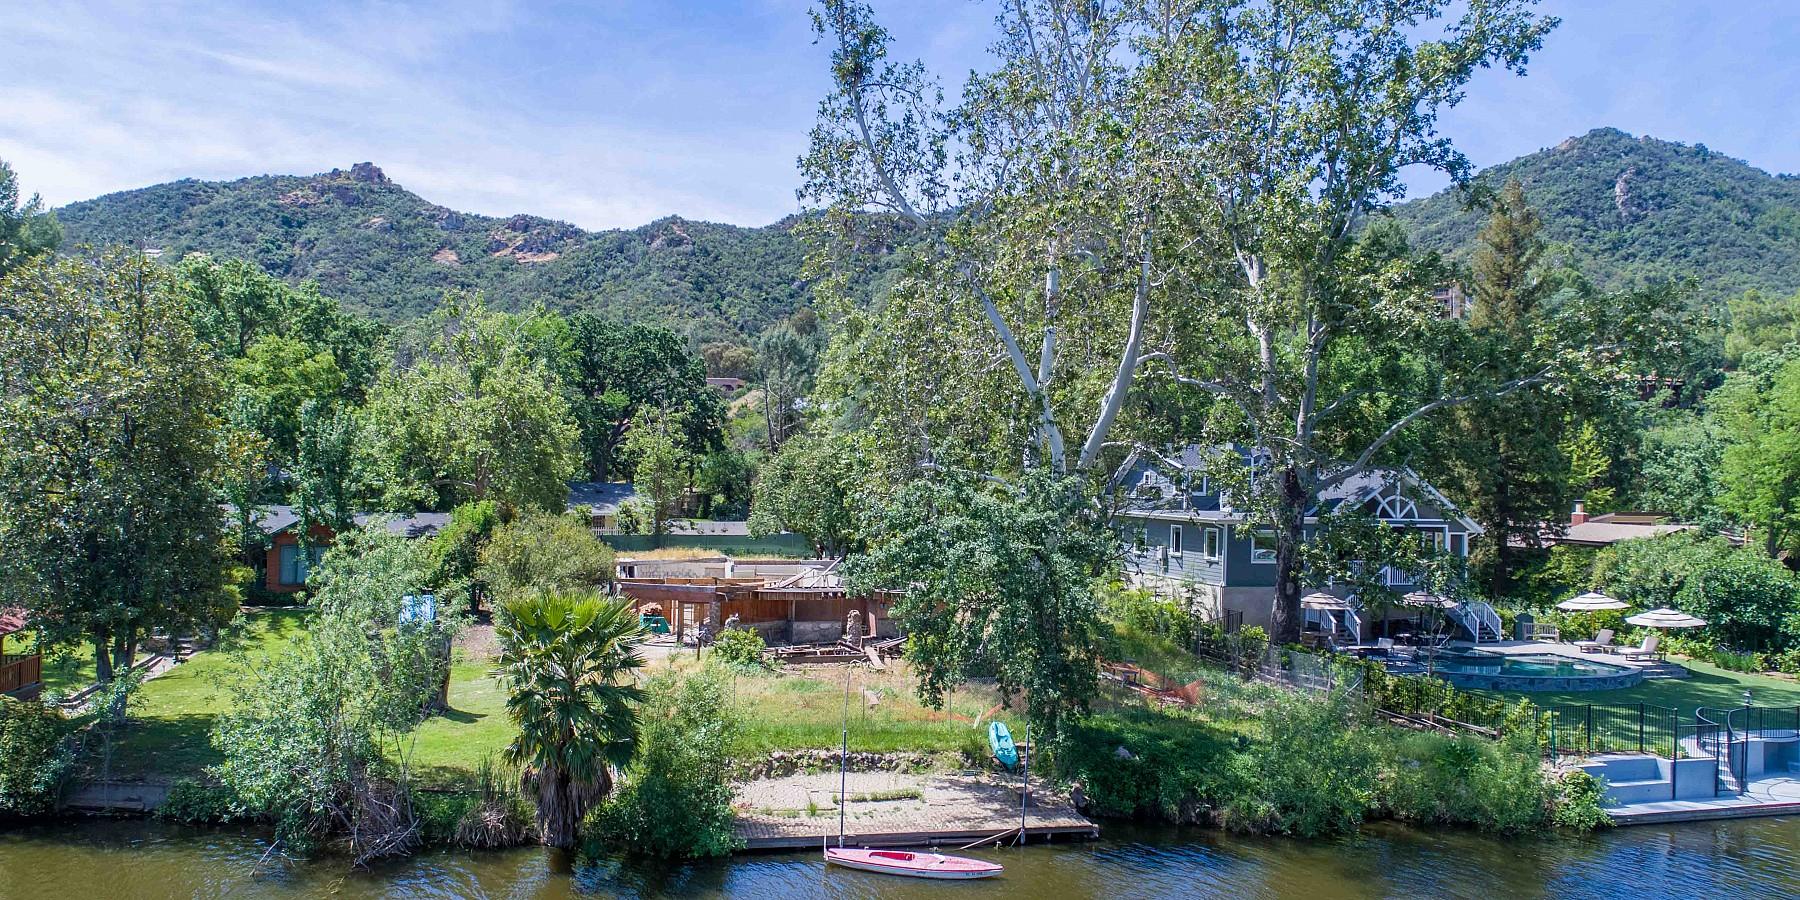 29225 South Lakeshore Drive, Malibou Lake, CA 91301